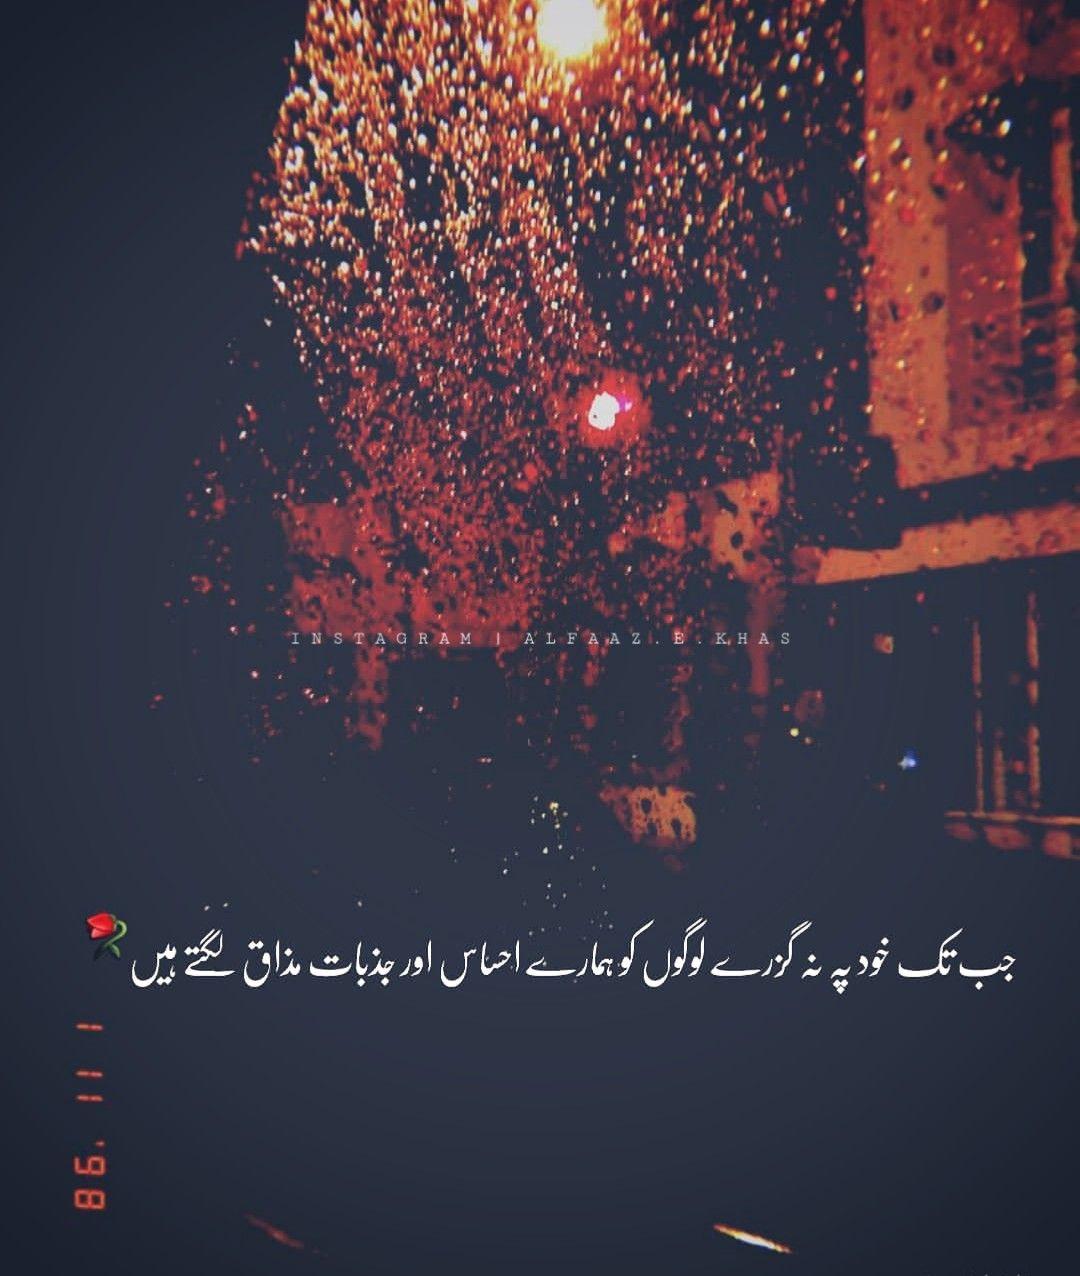 Follow Alfaaz E Khas On Instagram Poetry Feelings One Line Quotes Love Poetry Urdu